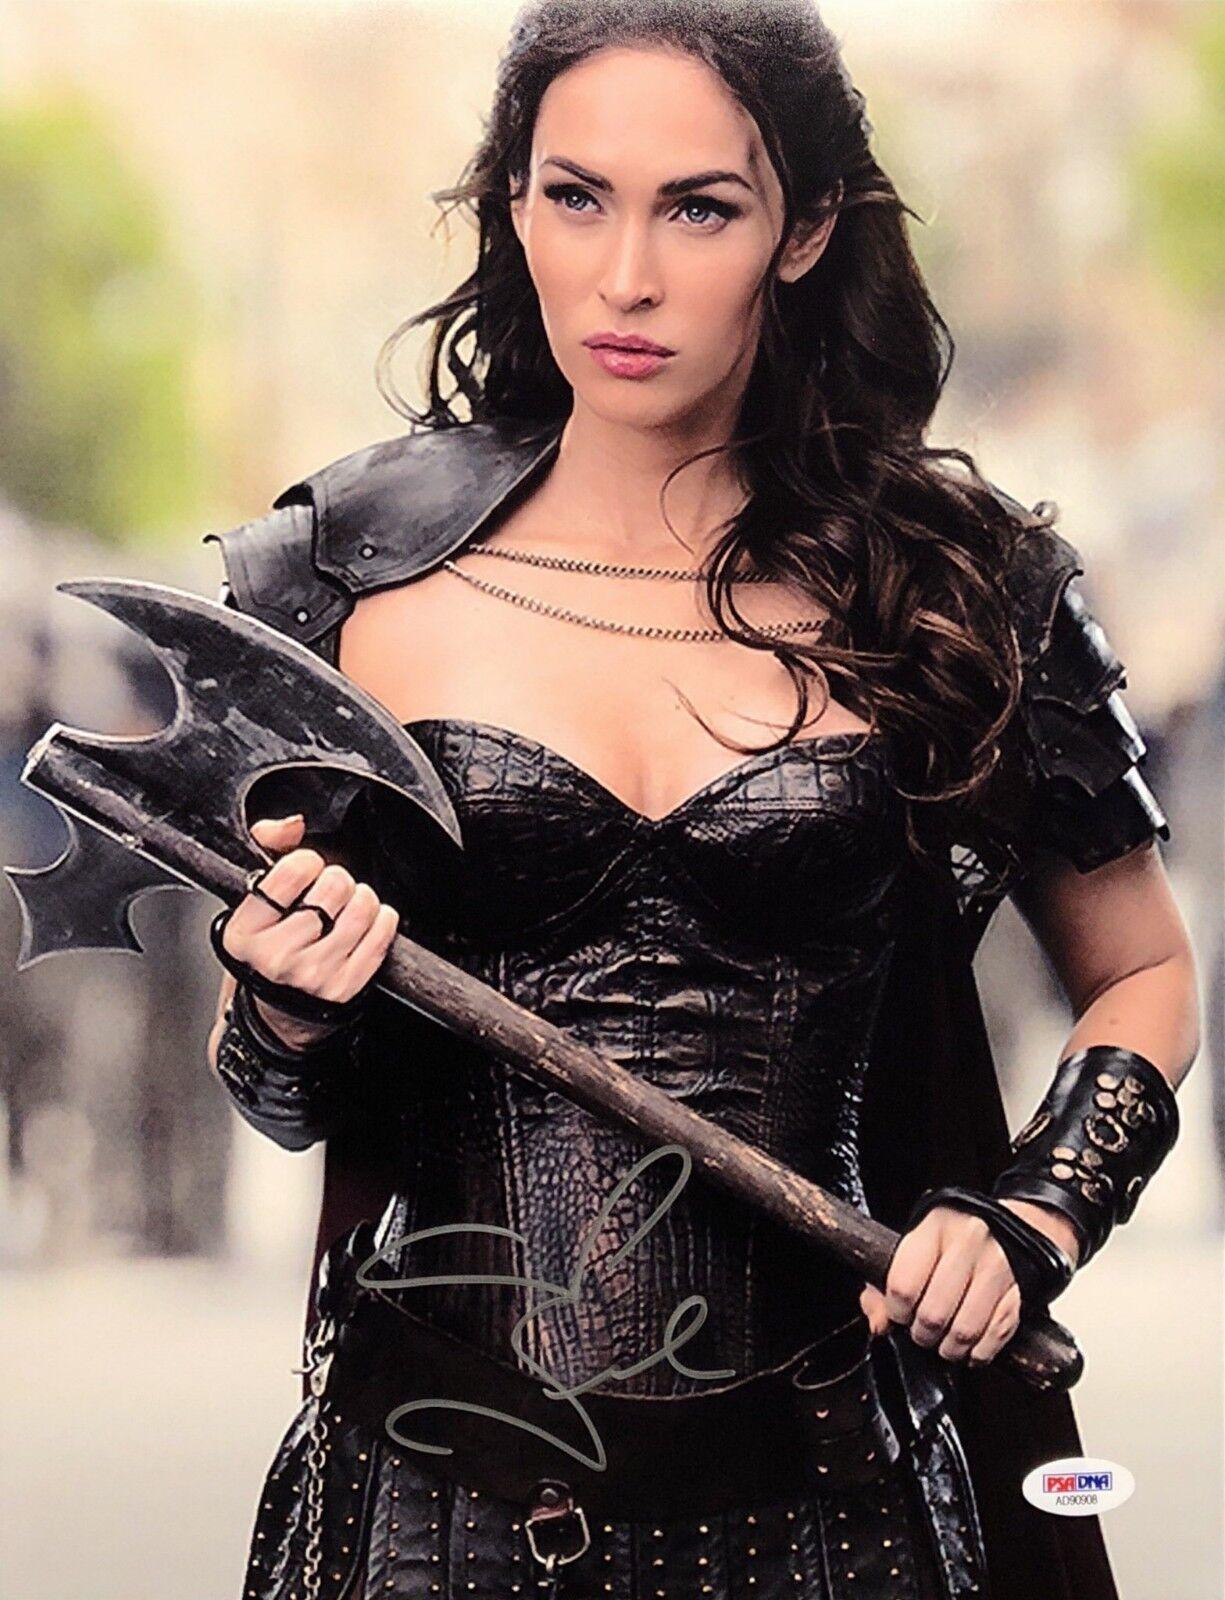 Megan Fox Signed 11x14 Photo *Model *Actress PSA AD90908